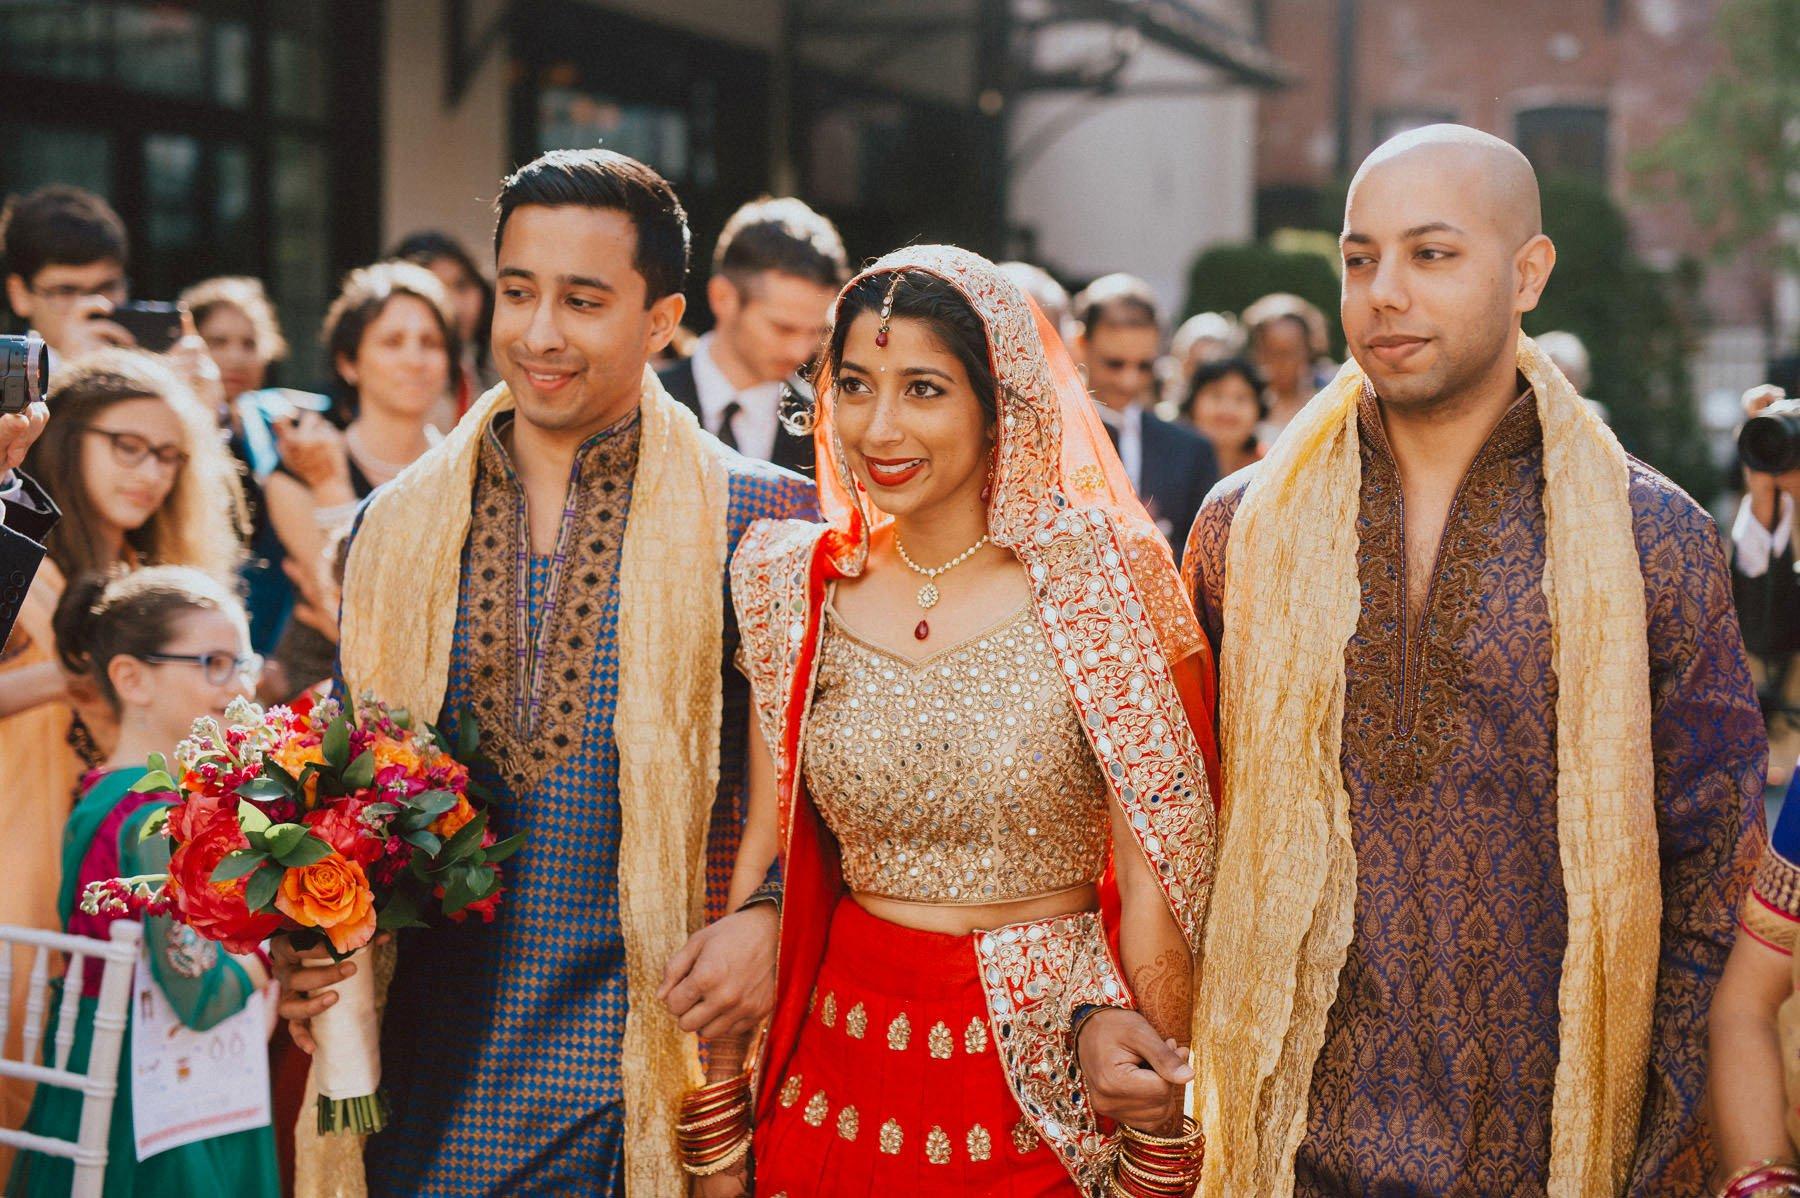 vie-philadelphia-indian-wedding-75.jpg